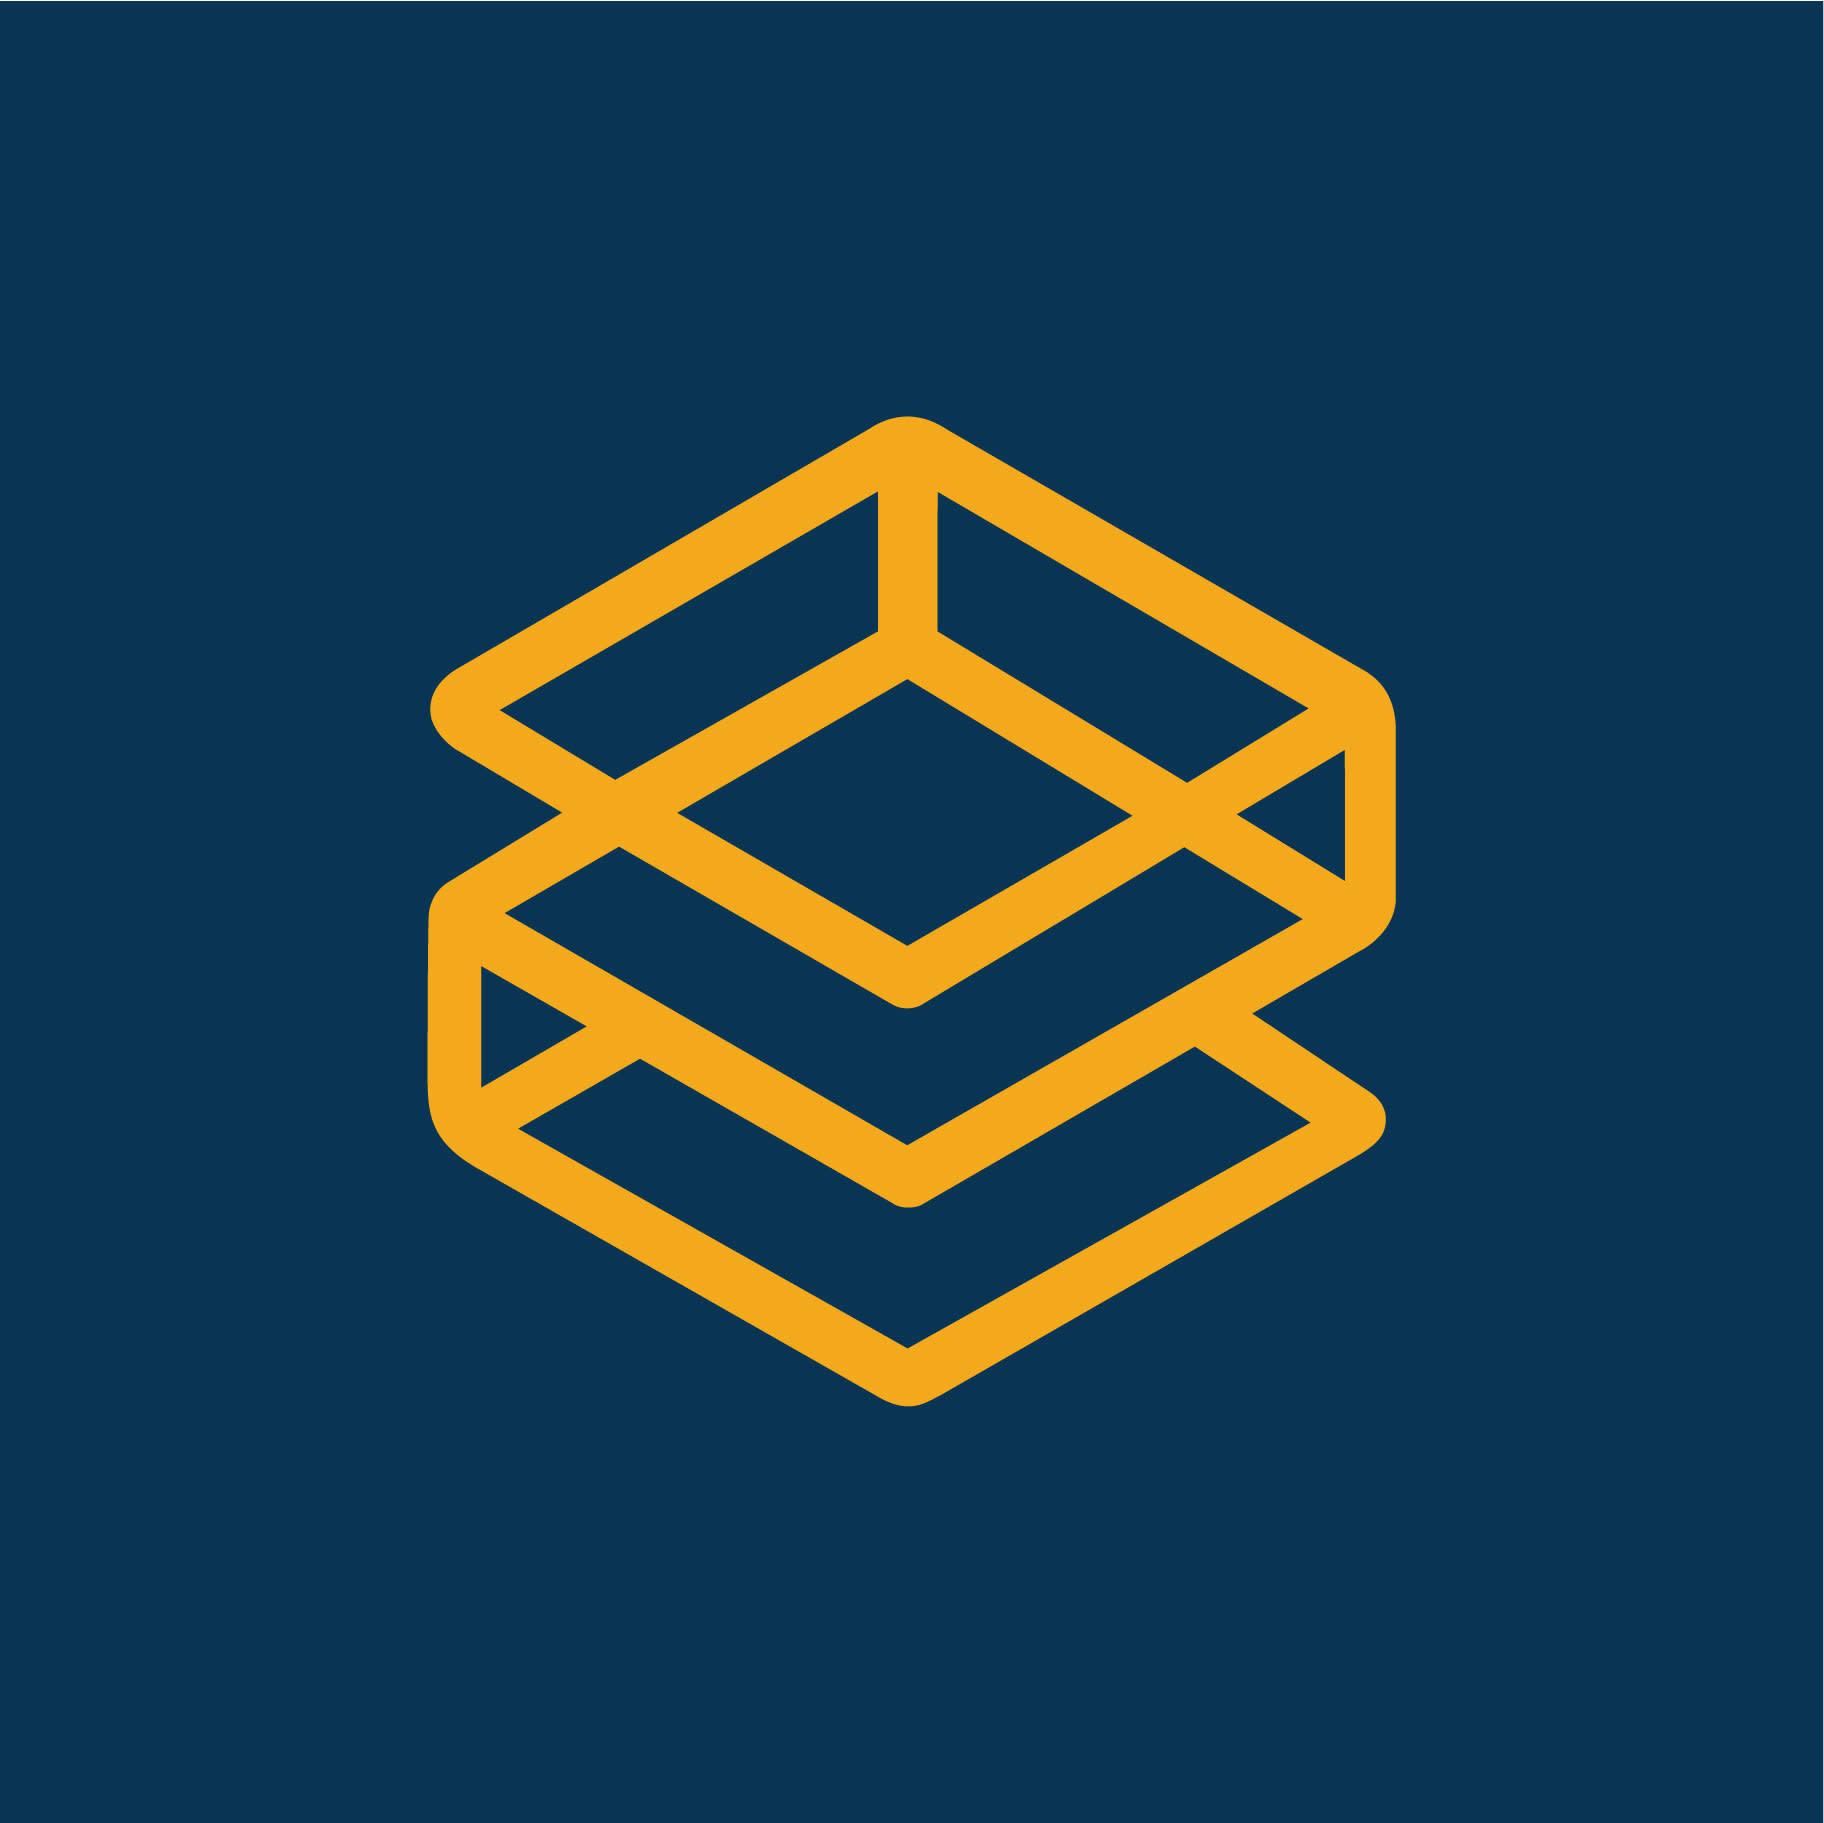 TrueLayer 's logo